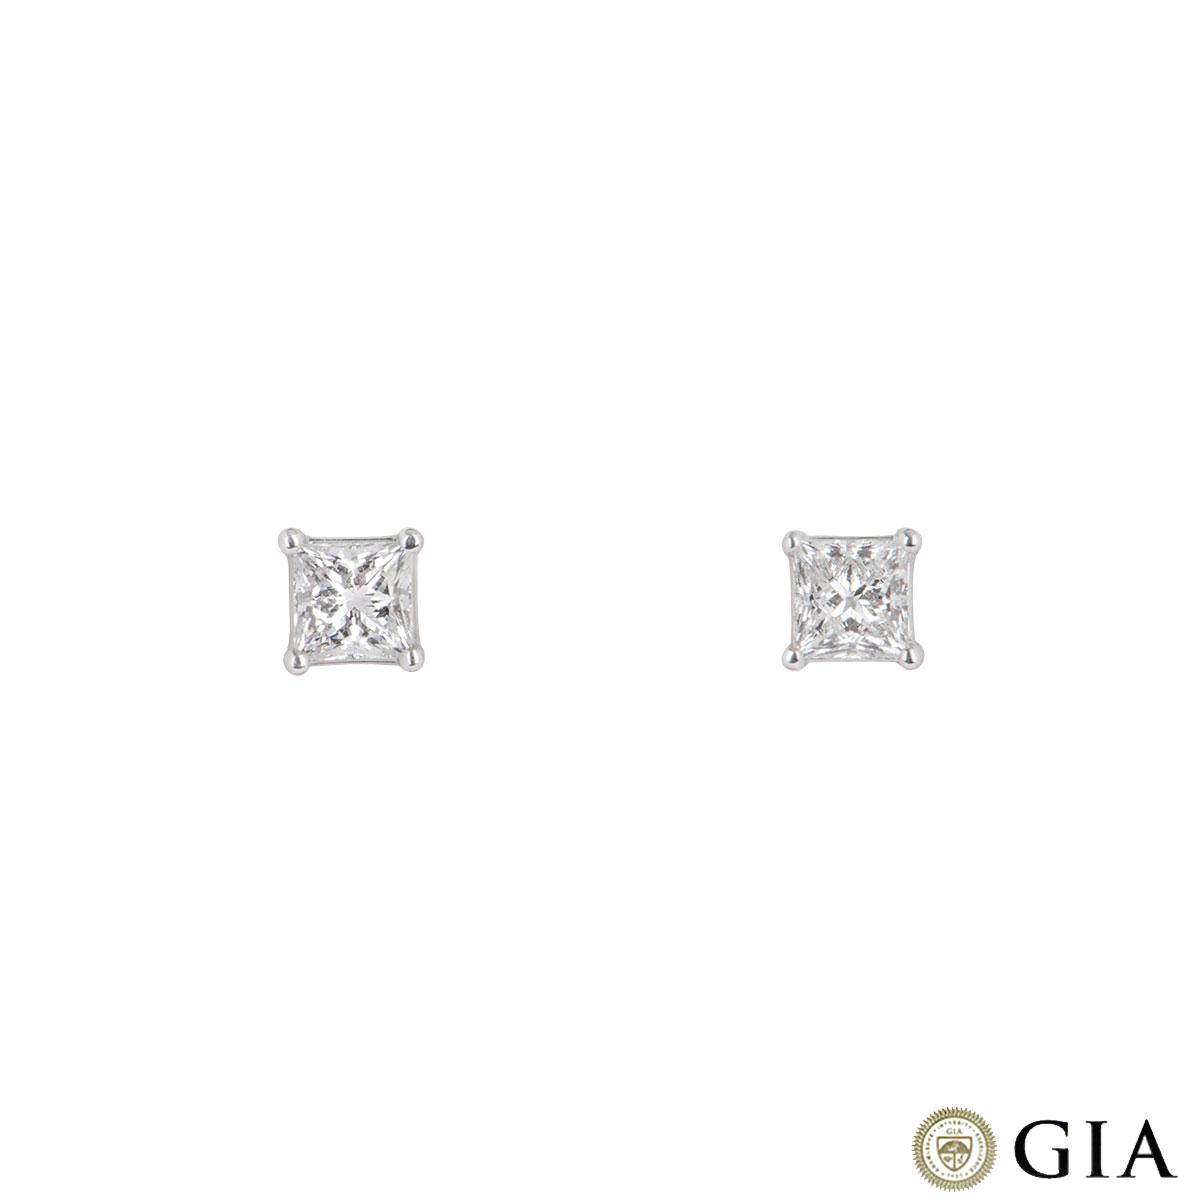 Princess Cut White Gold Diamond Earrings 0.70ct/0.72ct F/VS1